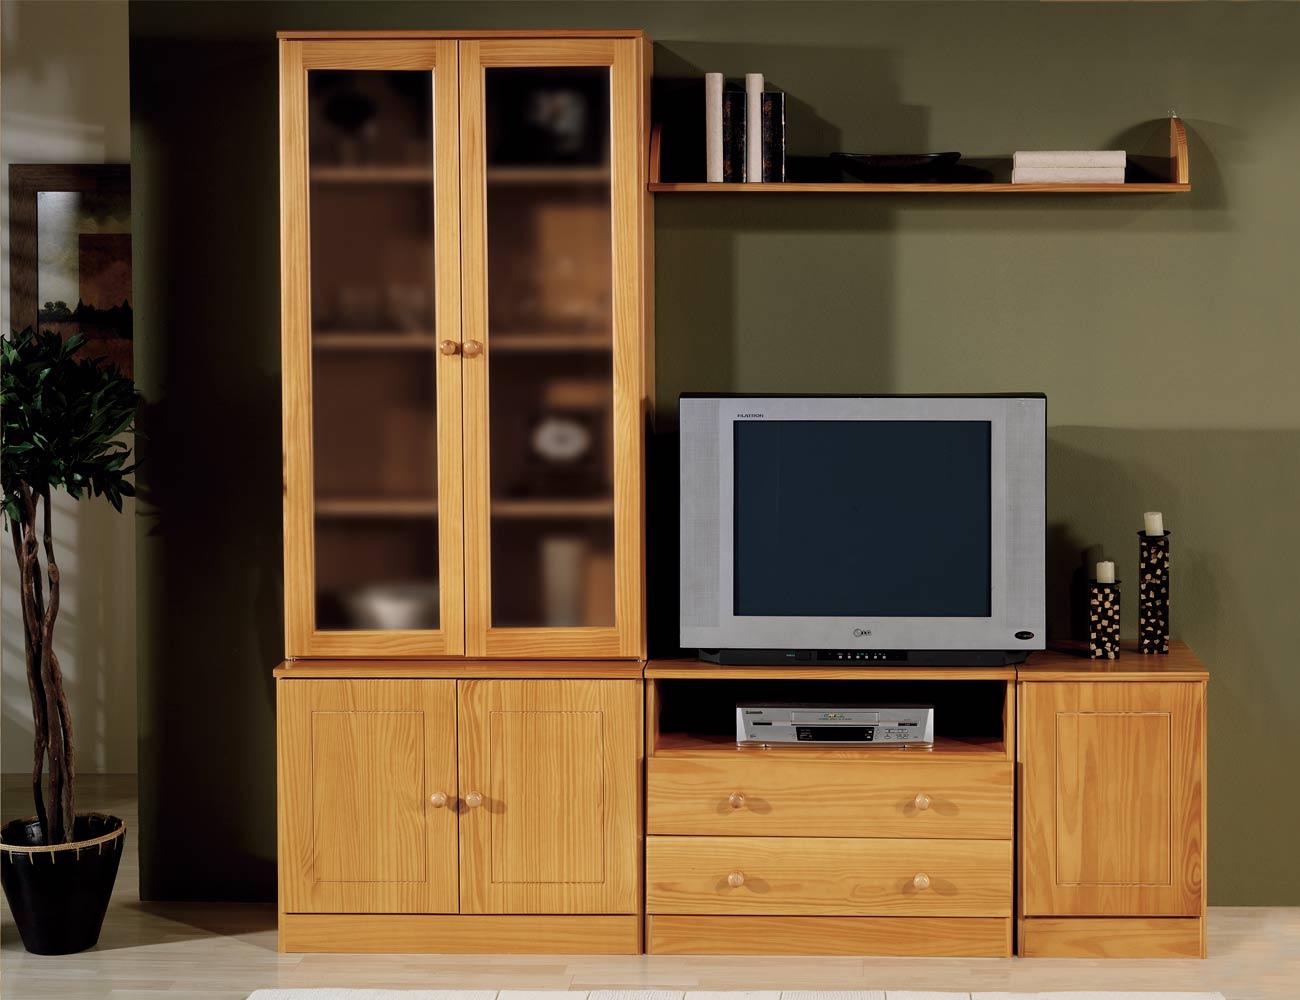 Composicion apilable 4 muebles provenzal madera pino